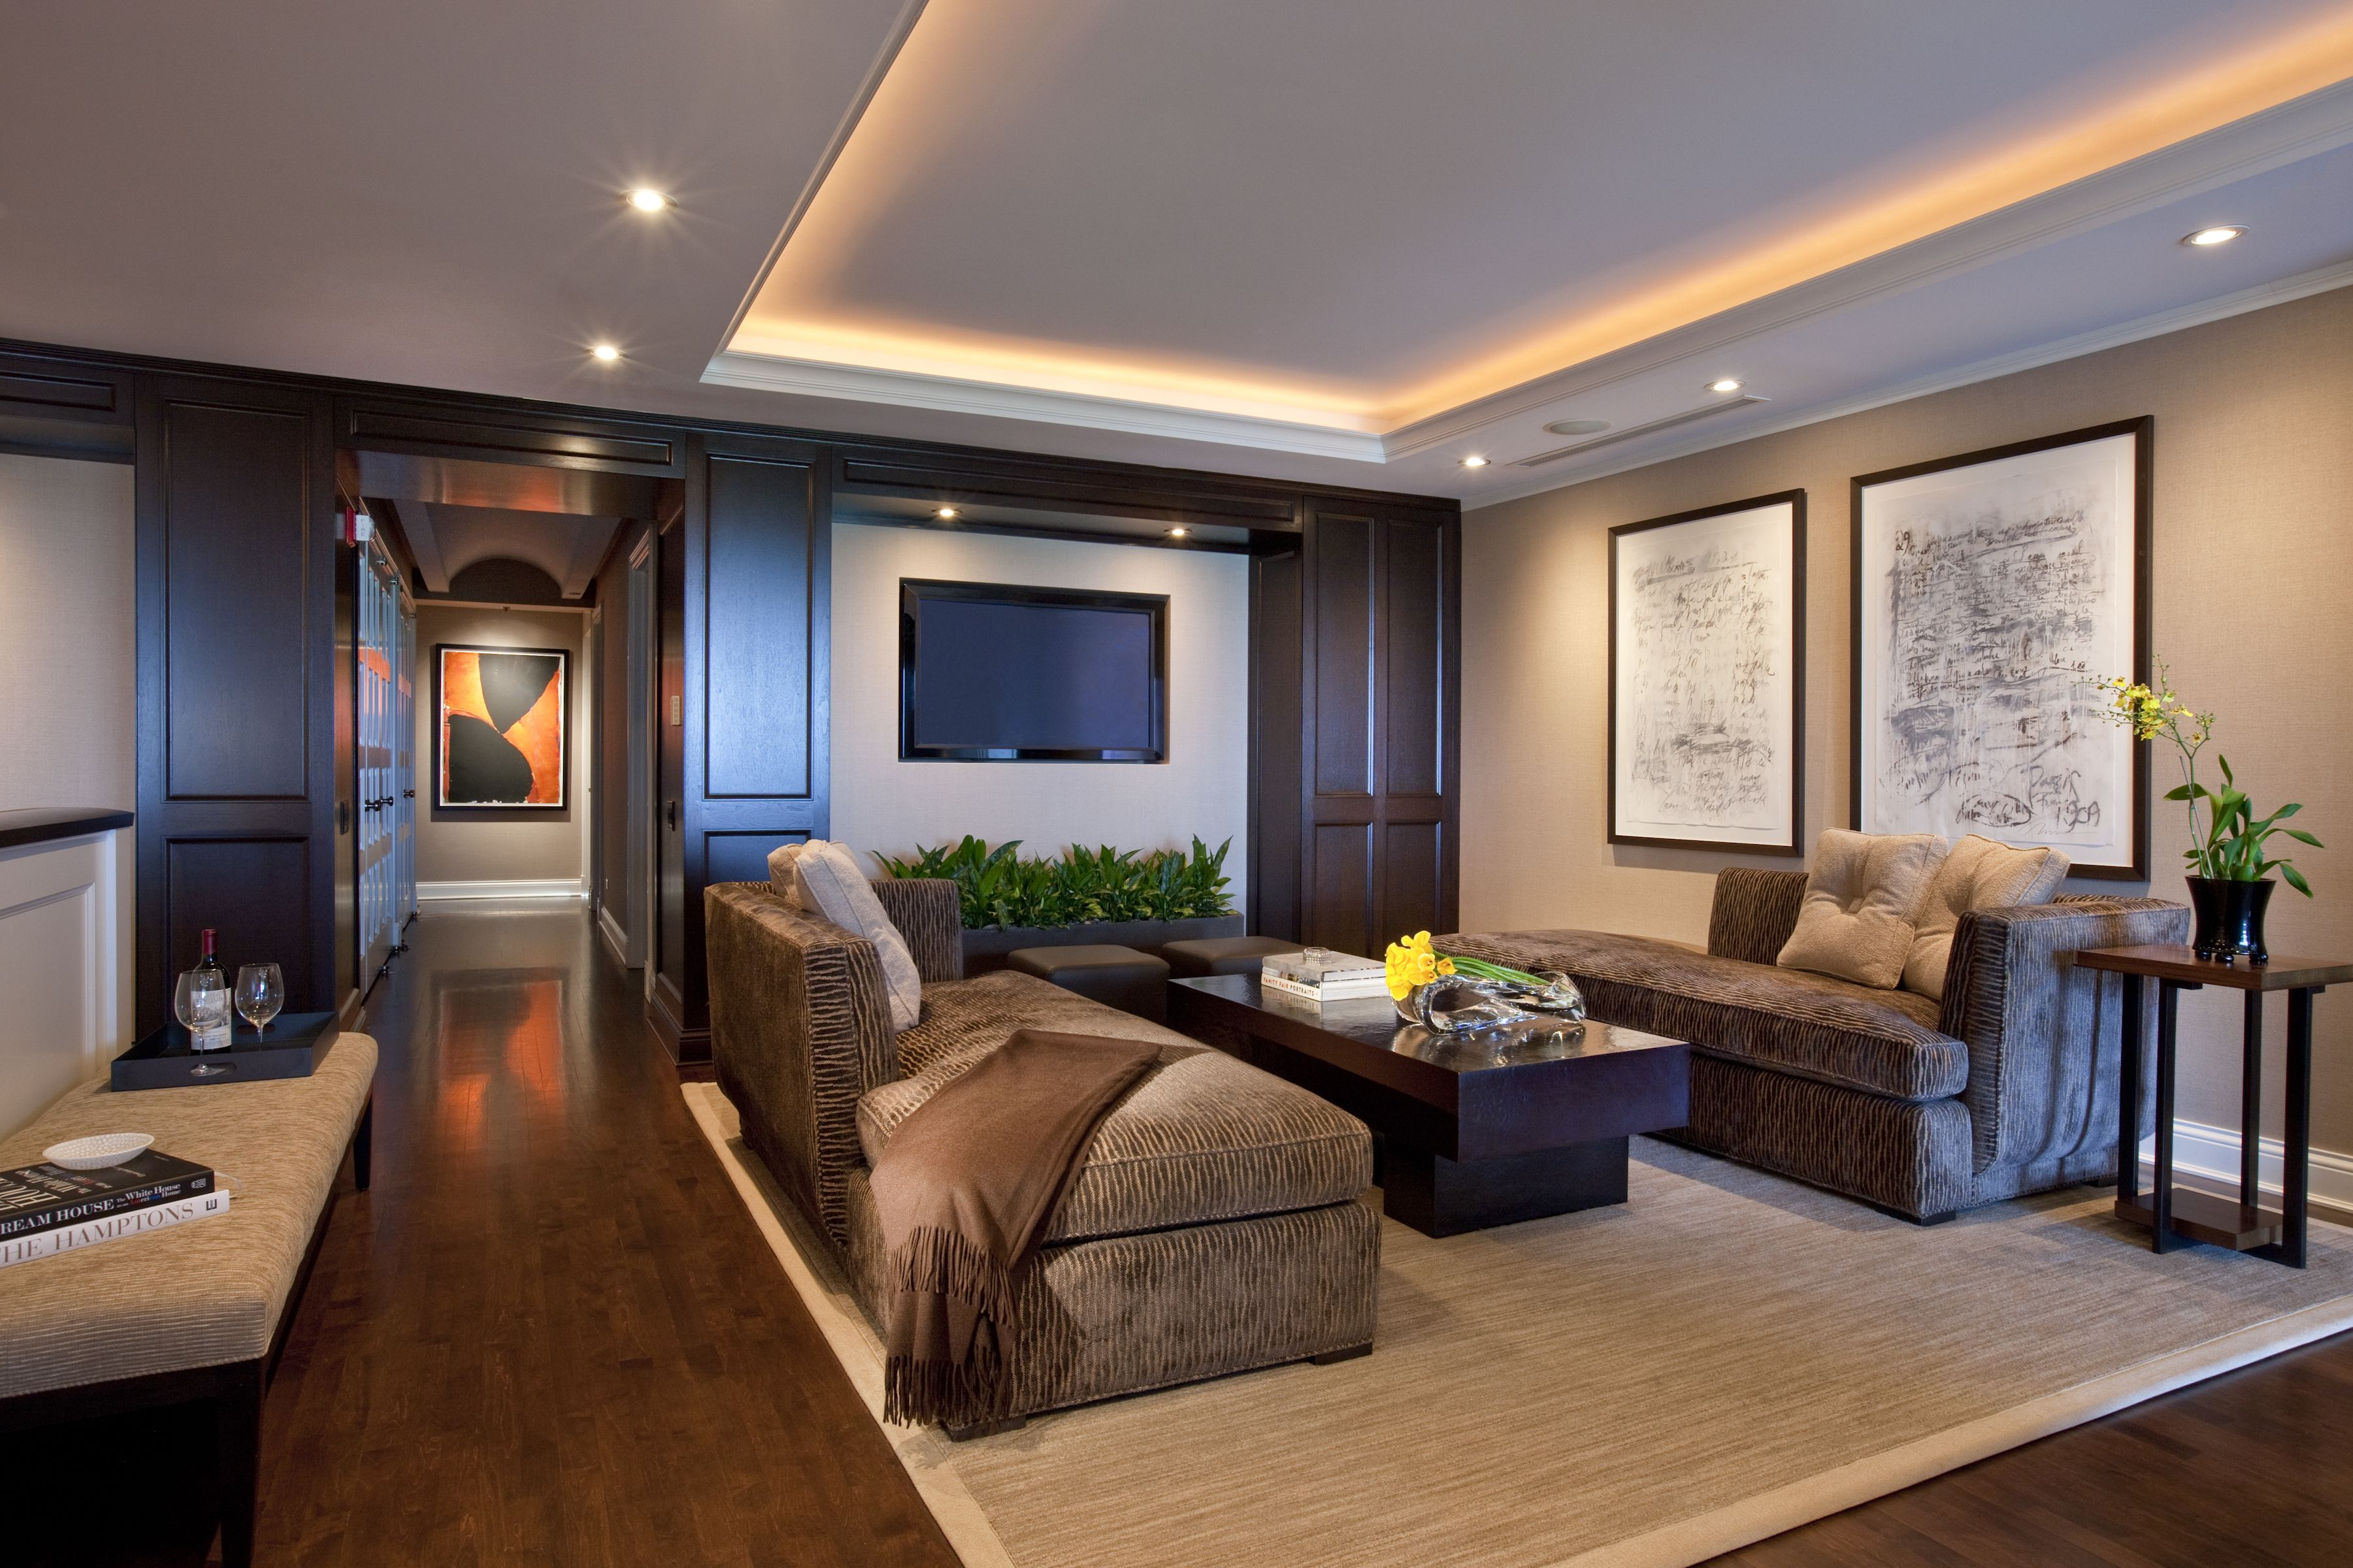 3d distortion interior design - Google Search | Recessed ...